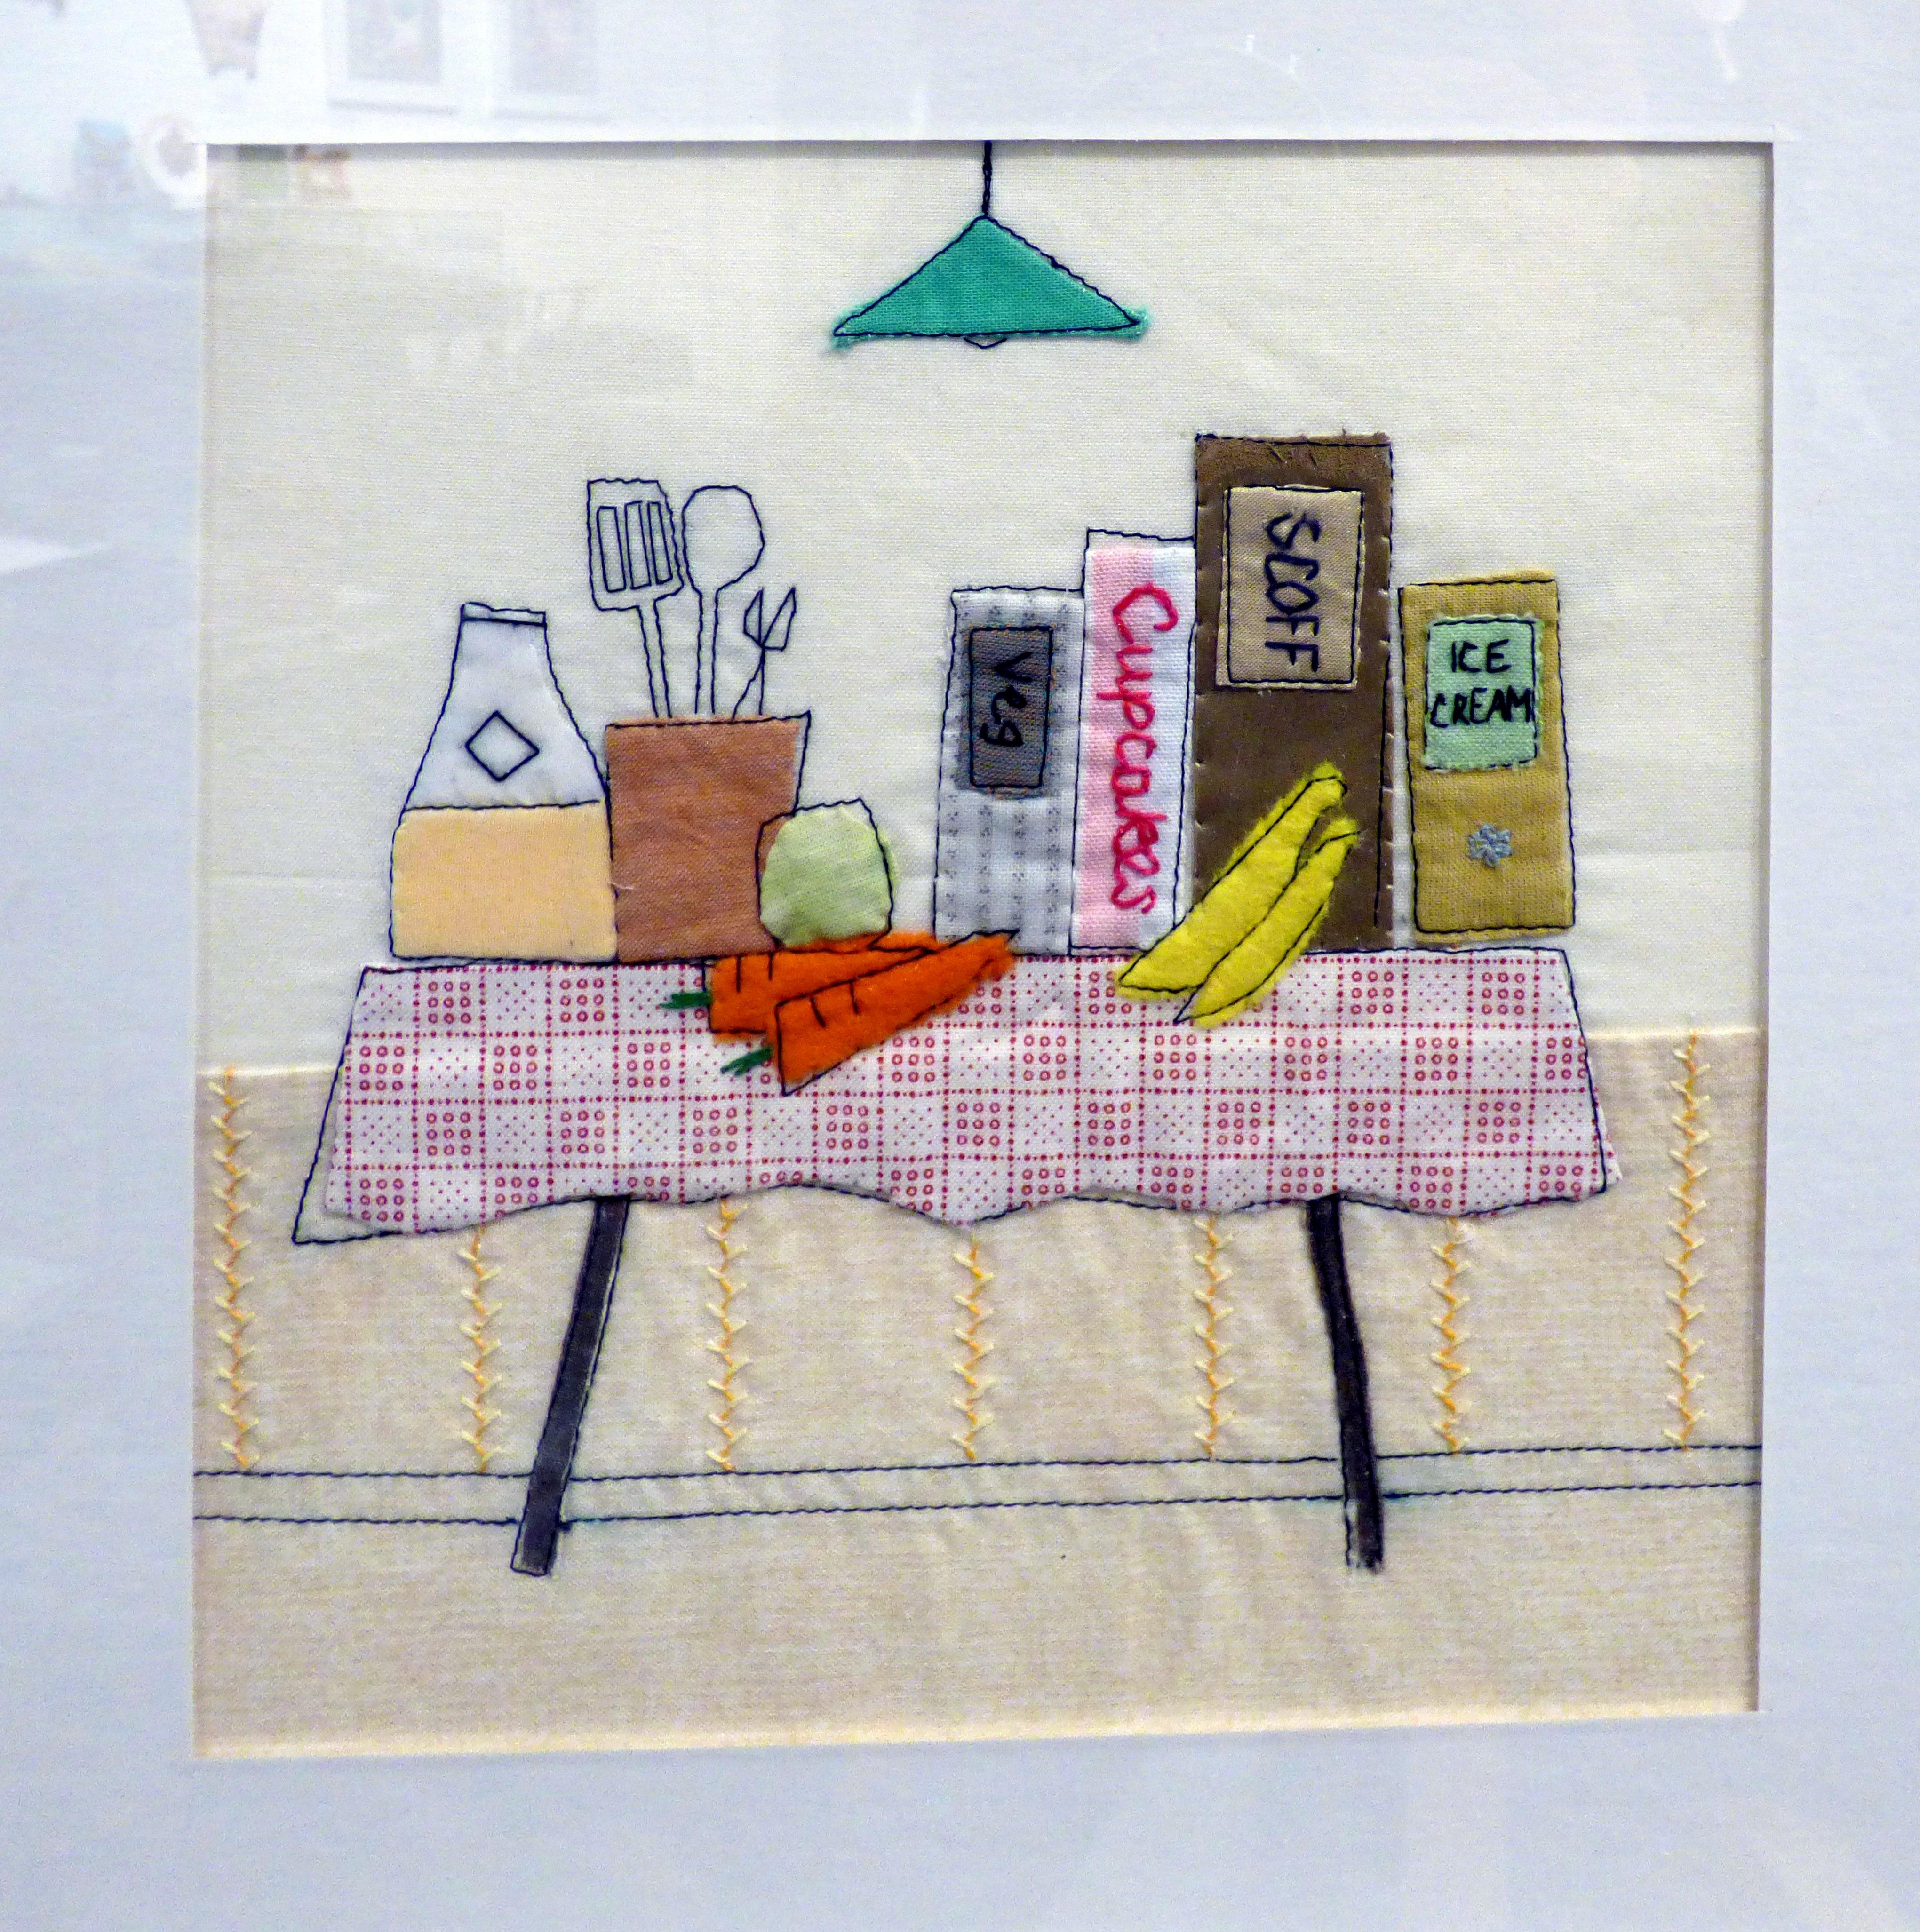 STILL LIFE WITH BOOKS 2 by Caroline Turner, Ten Plus exhibition, Nantwich